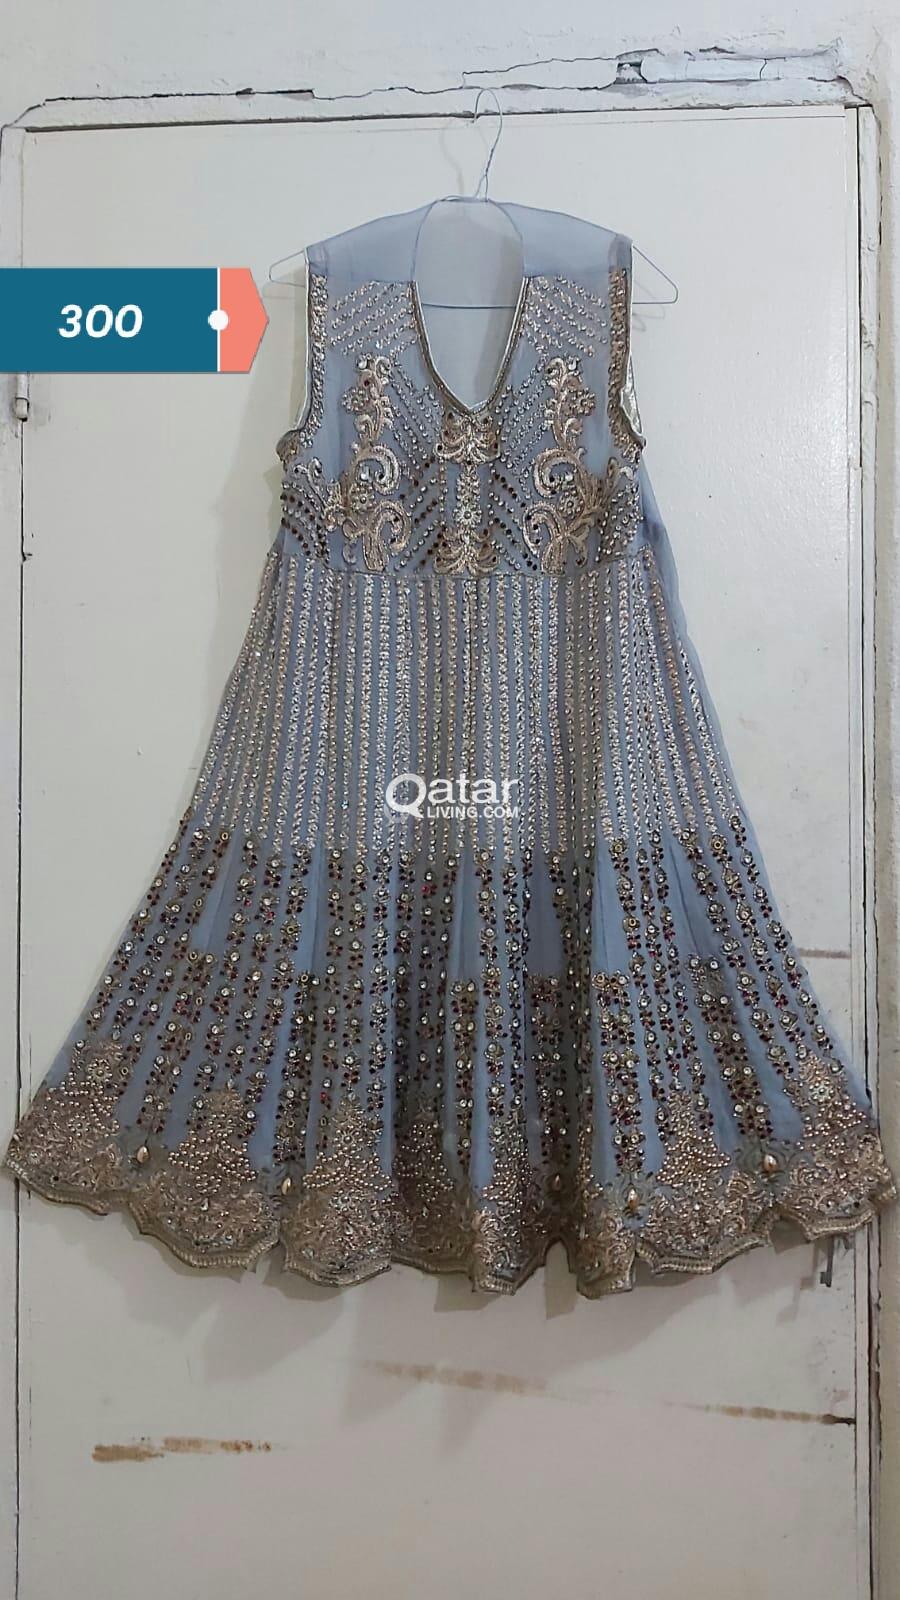 Qatar Garments Buyers